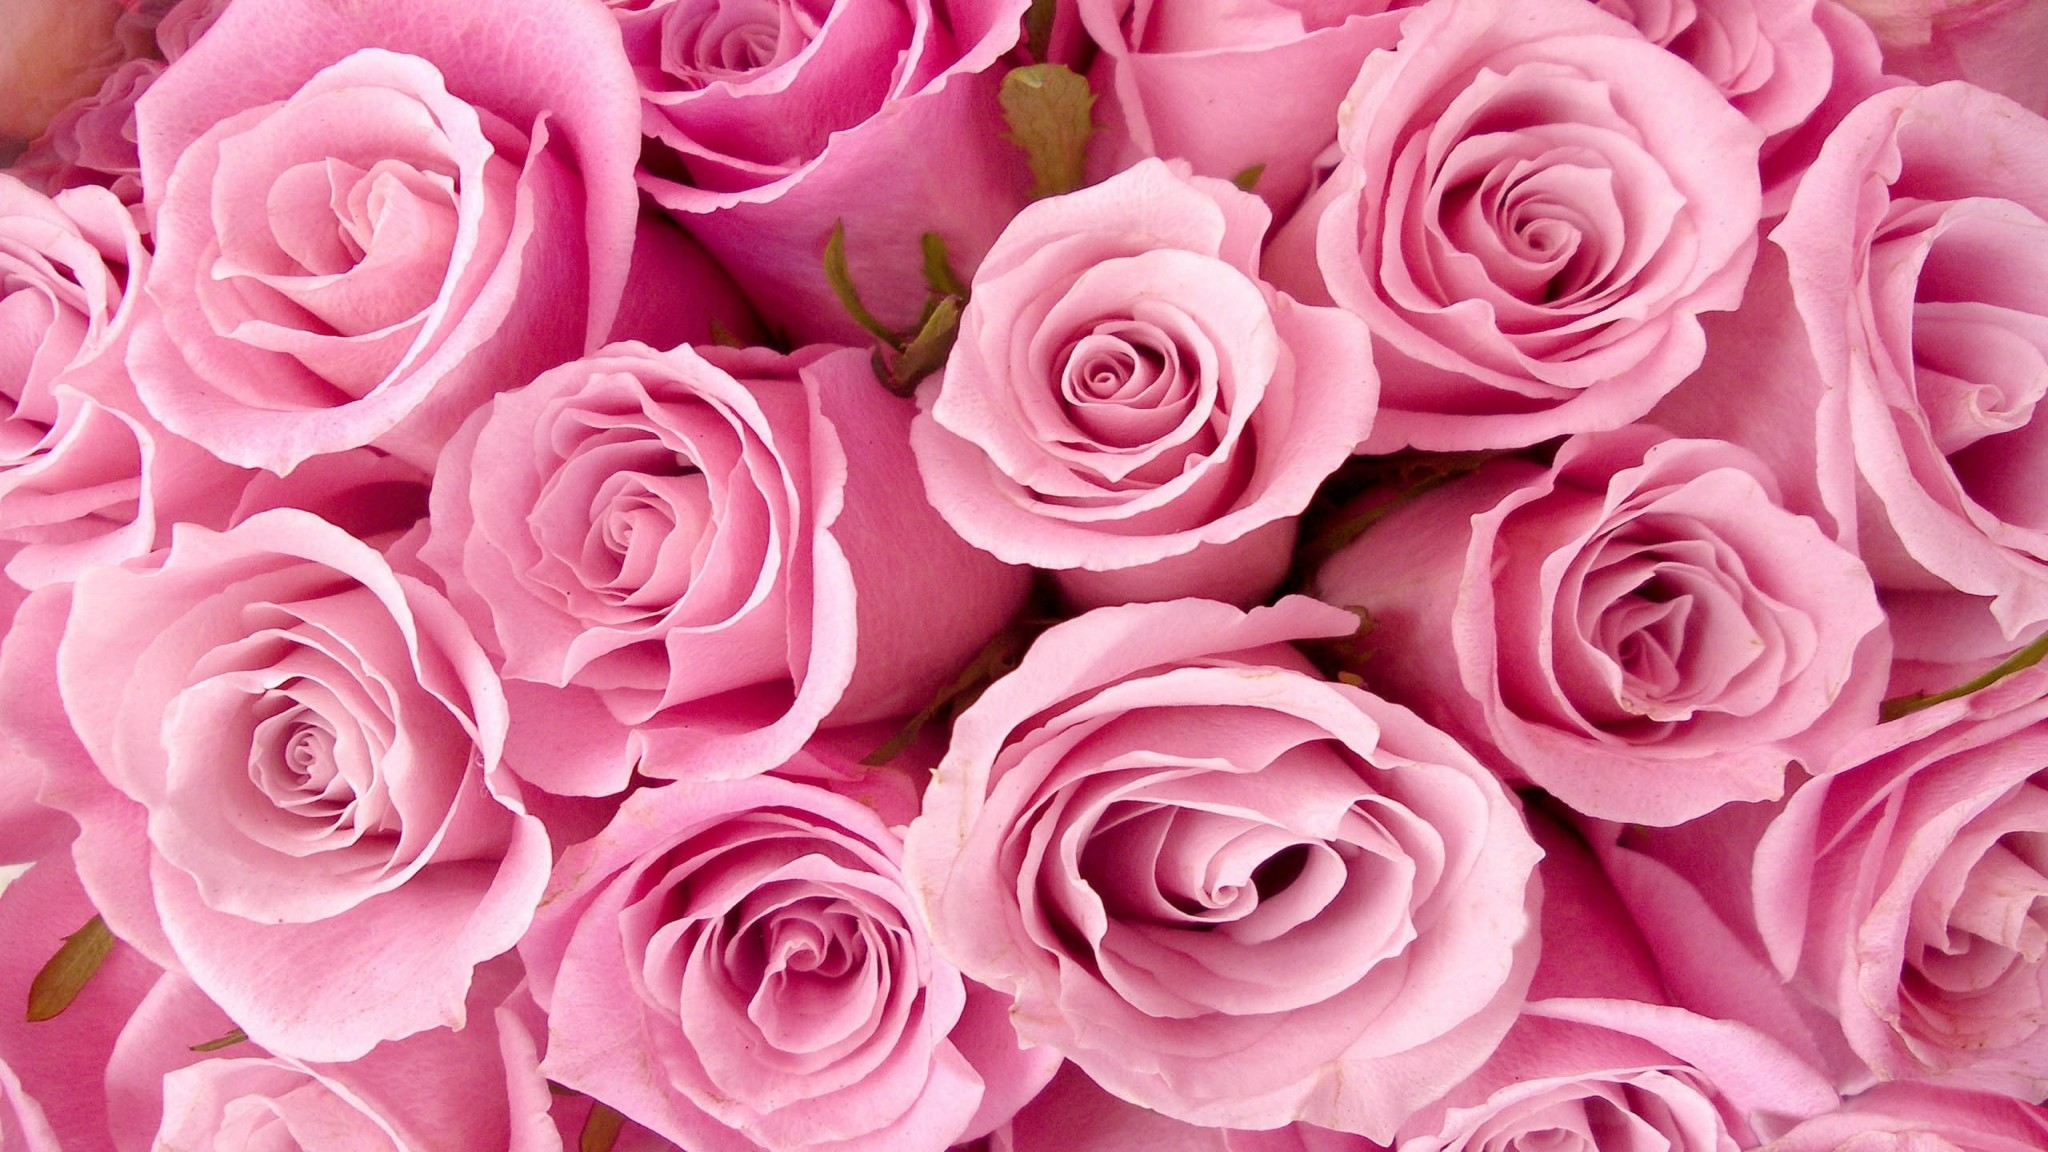 Wallpapers : Special Pink Roses #1289 2560×1600 pixel Exotic Wallpaper .